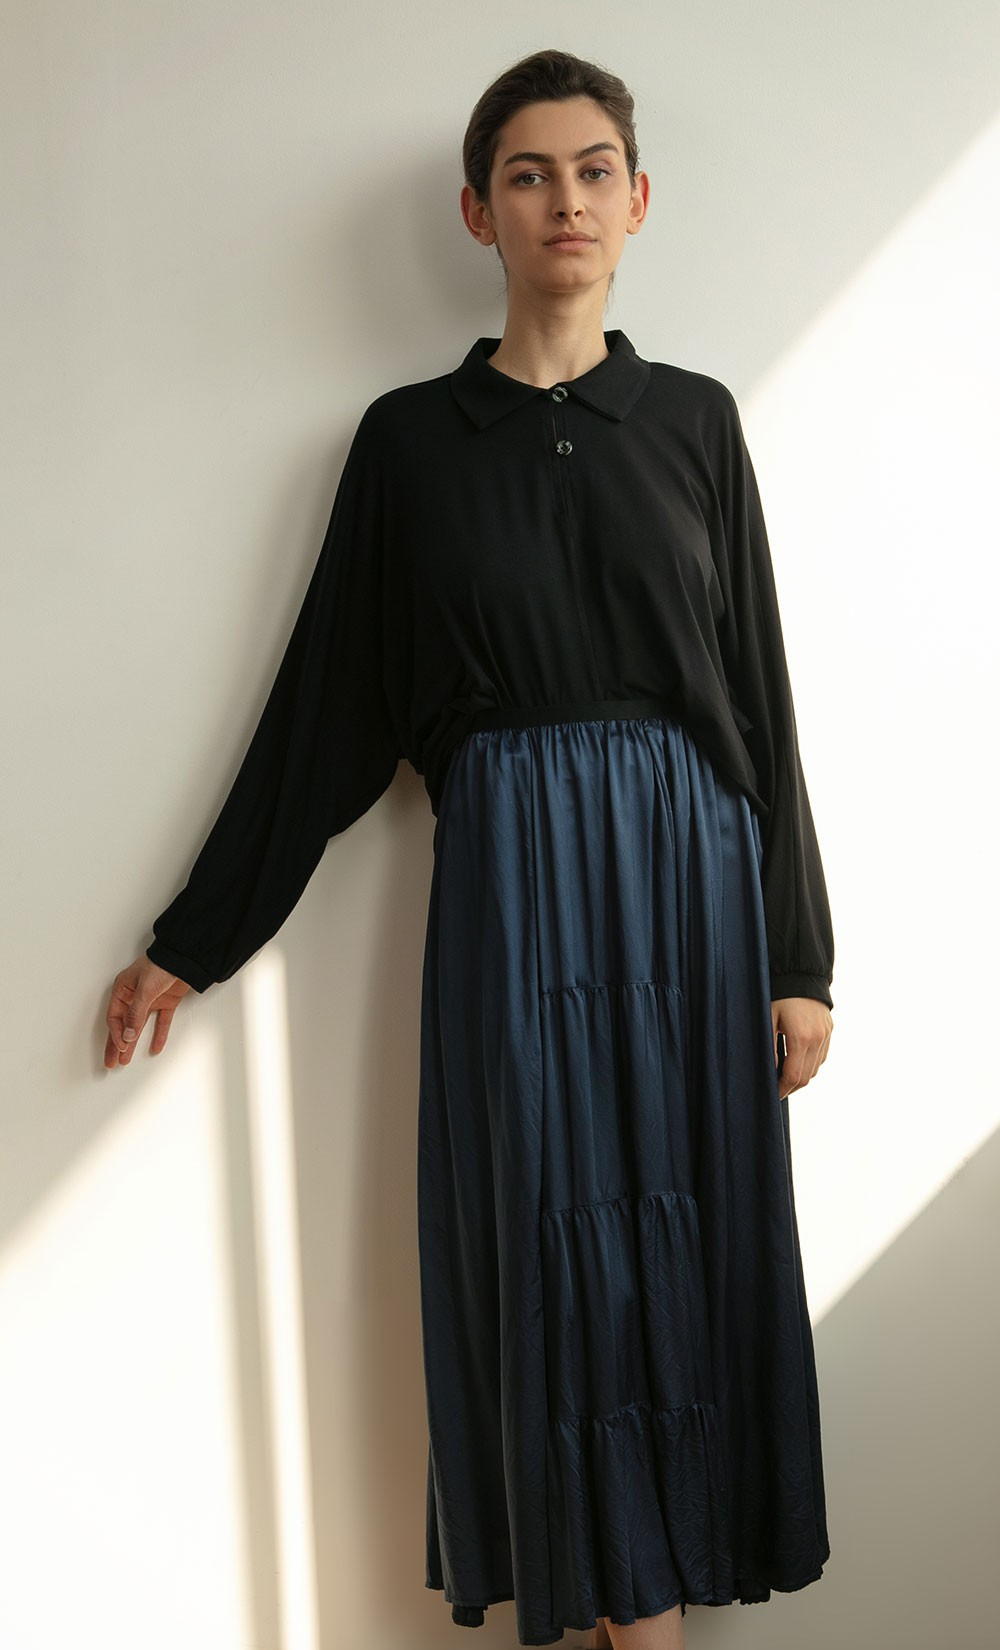 Mulan Skirt